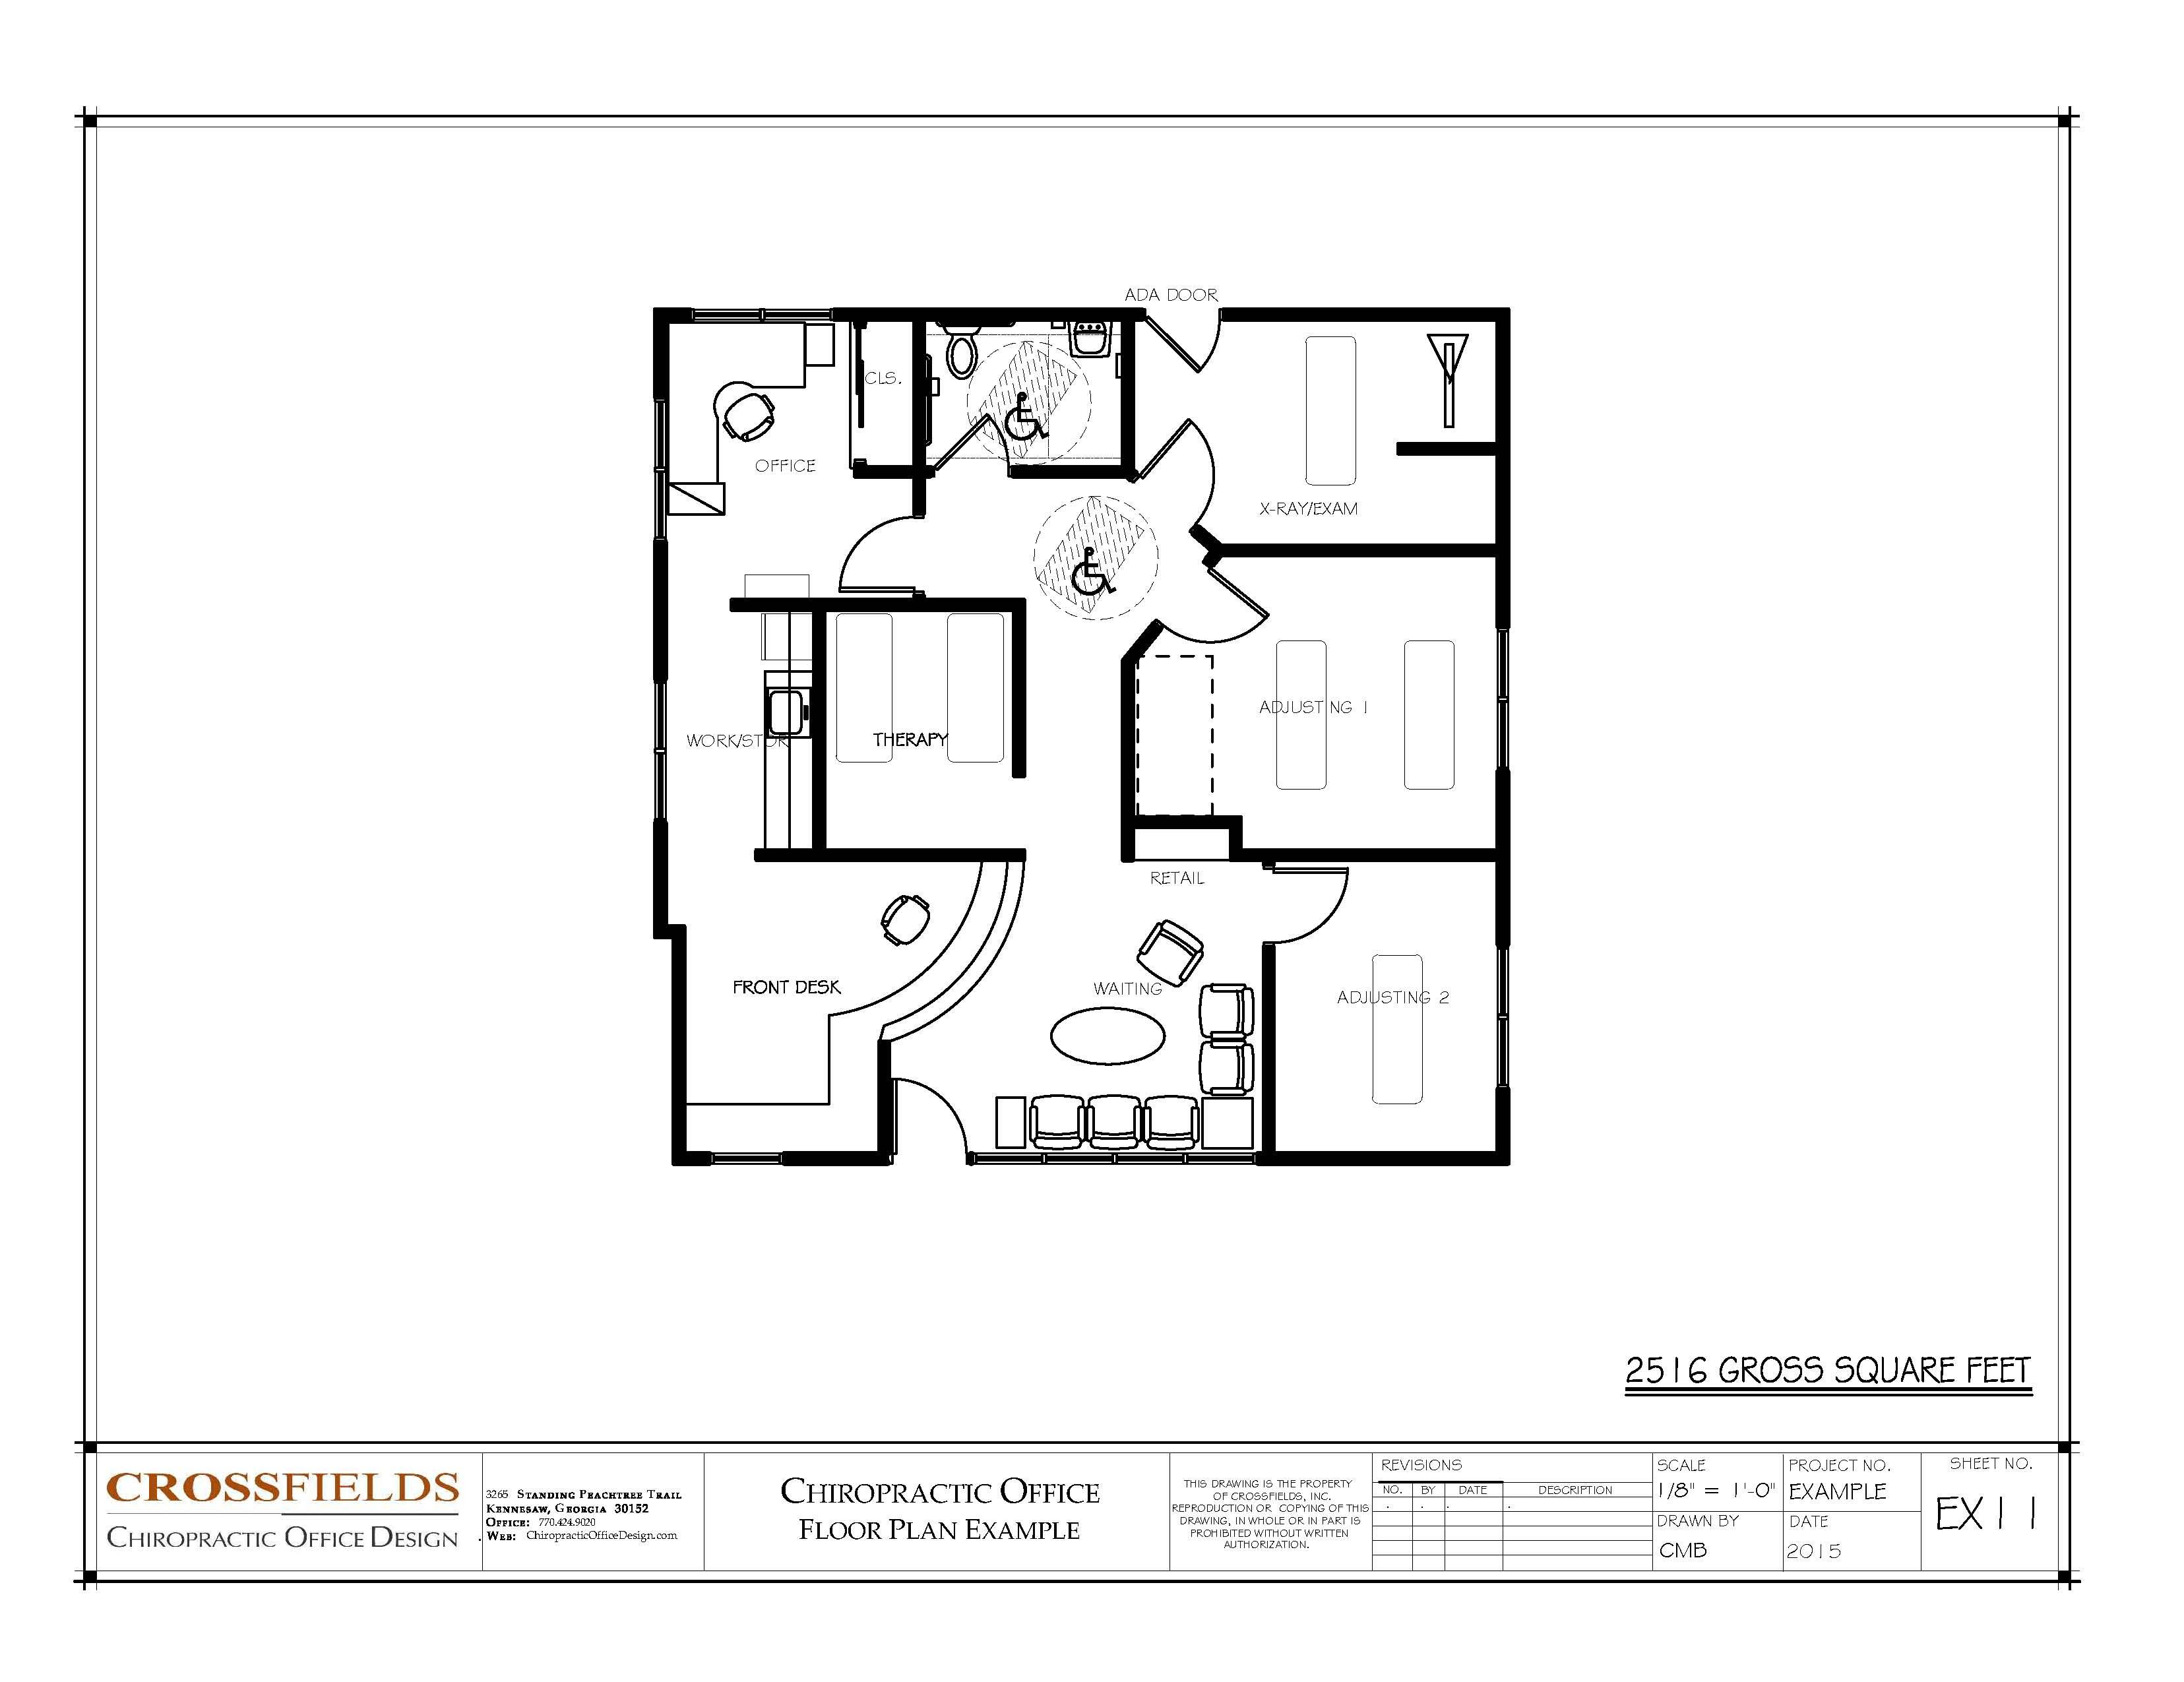 Drawn office floor plan design Ideas Ft Chiropractic Gross See